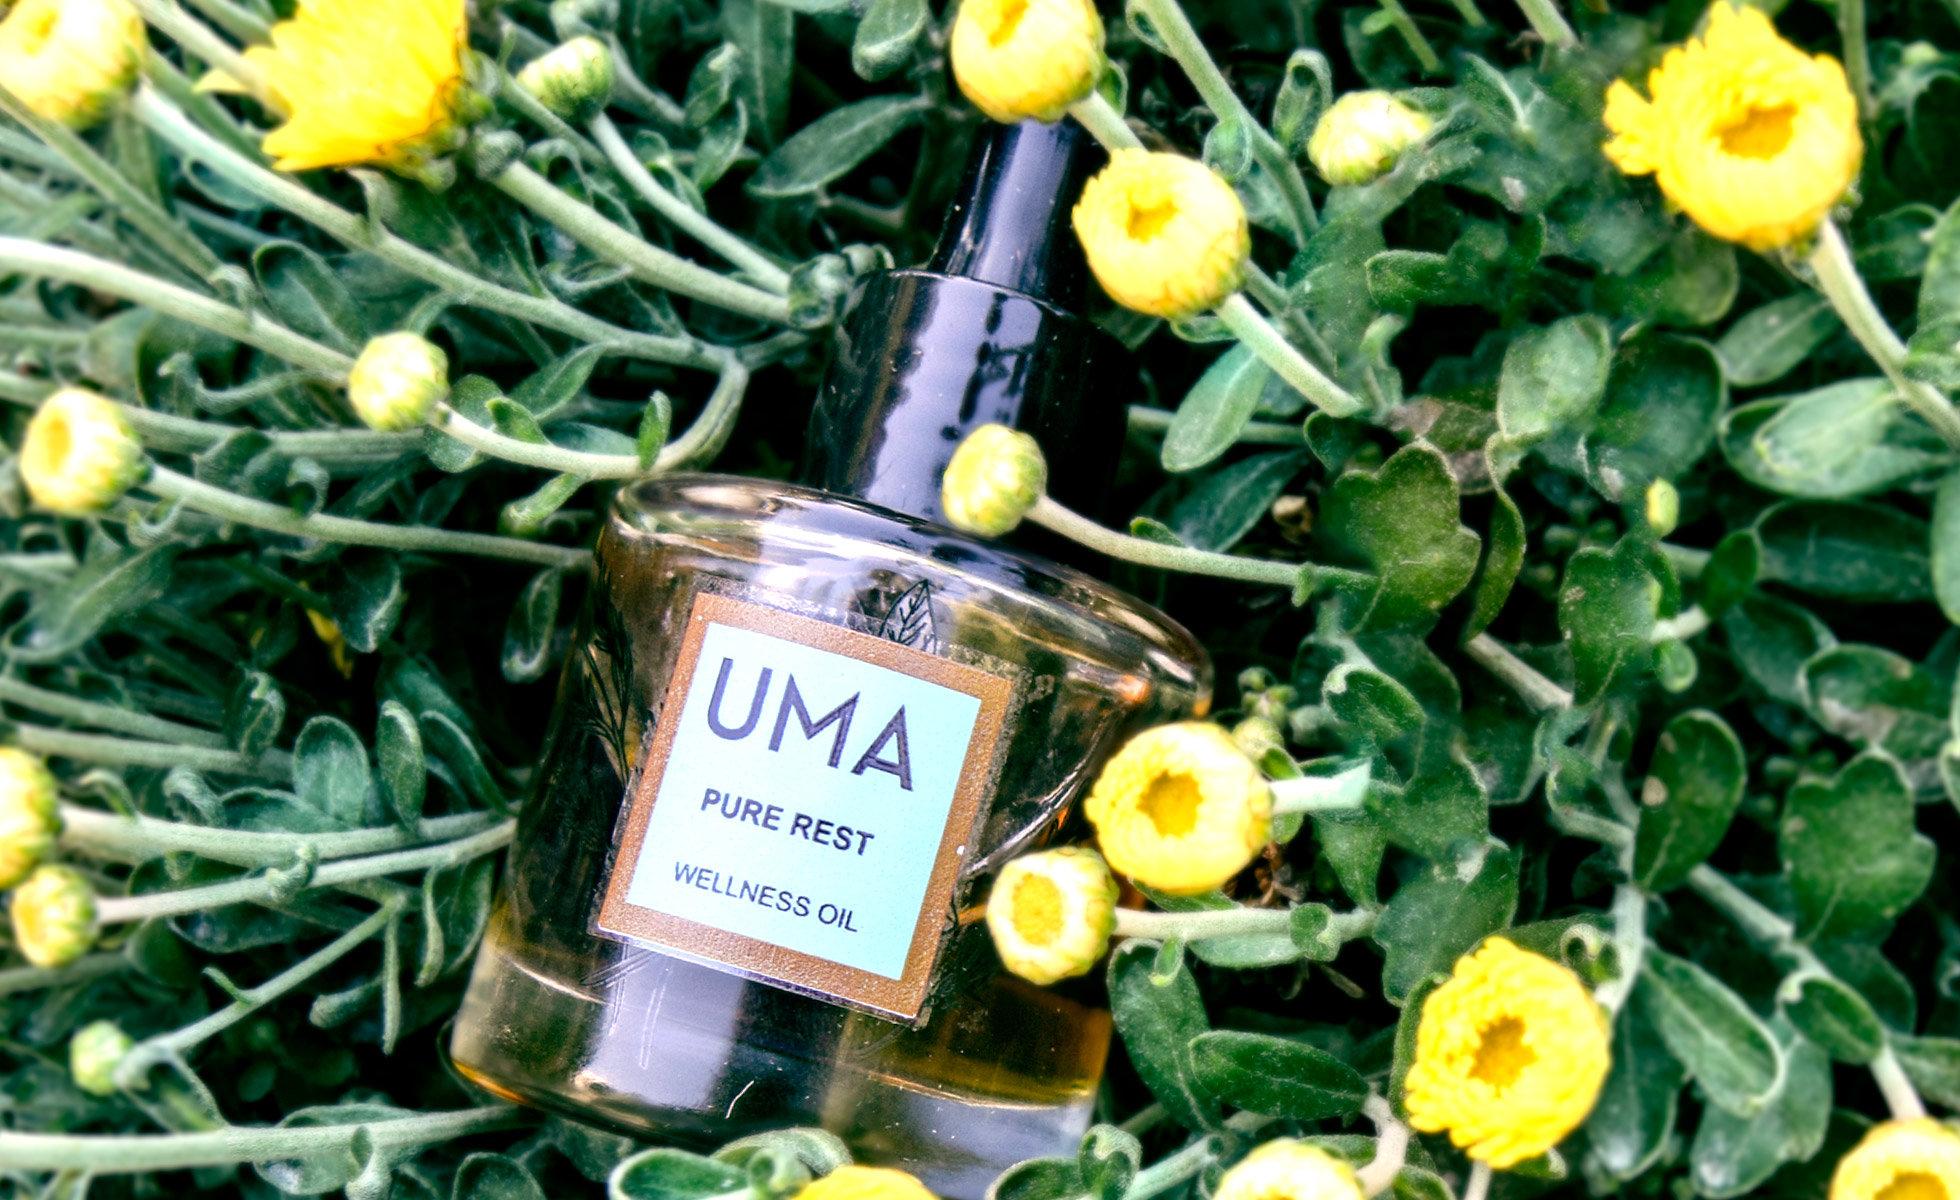 Photo: Uma Pure Rest Wellness Oil